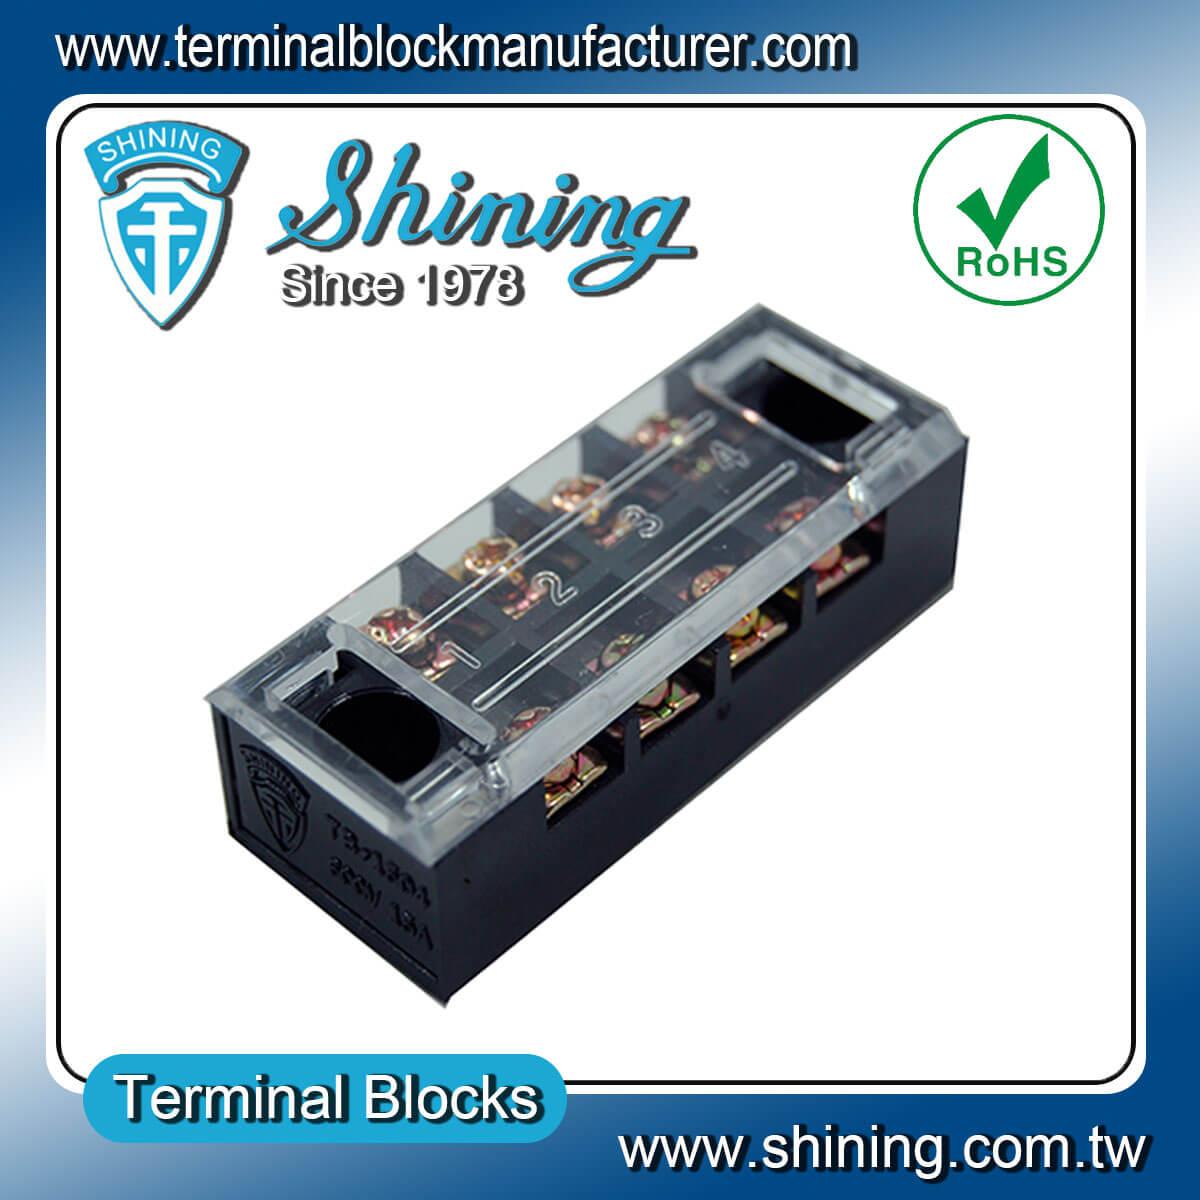 TB-2504L 600V 25A 4Pole固定式柵欄端子台